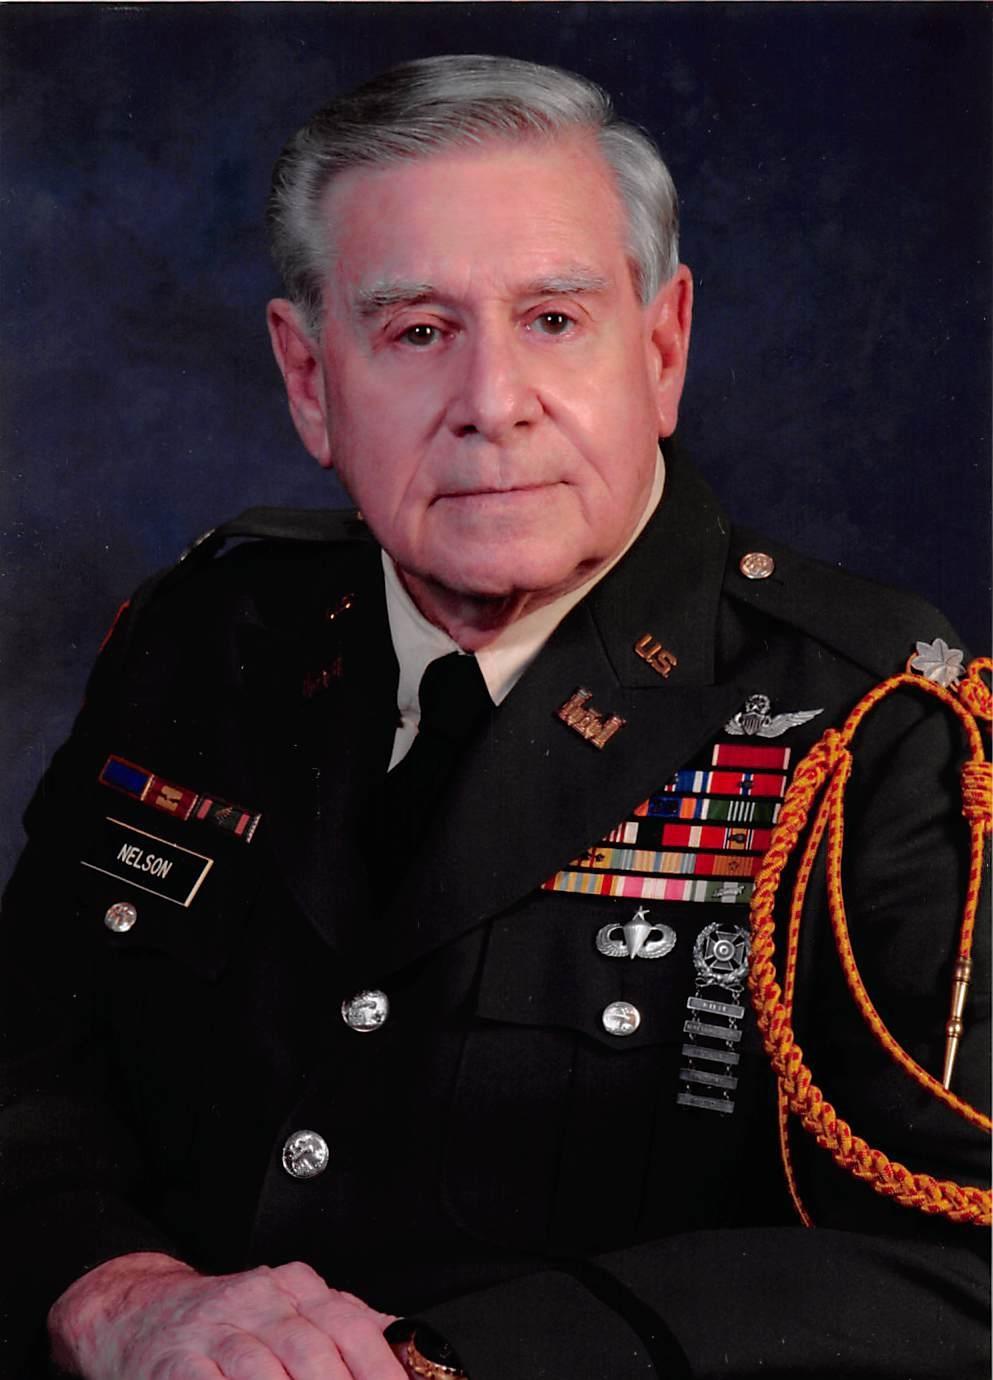 Russell David Nelson